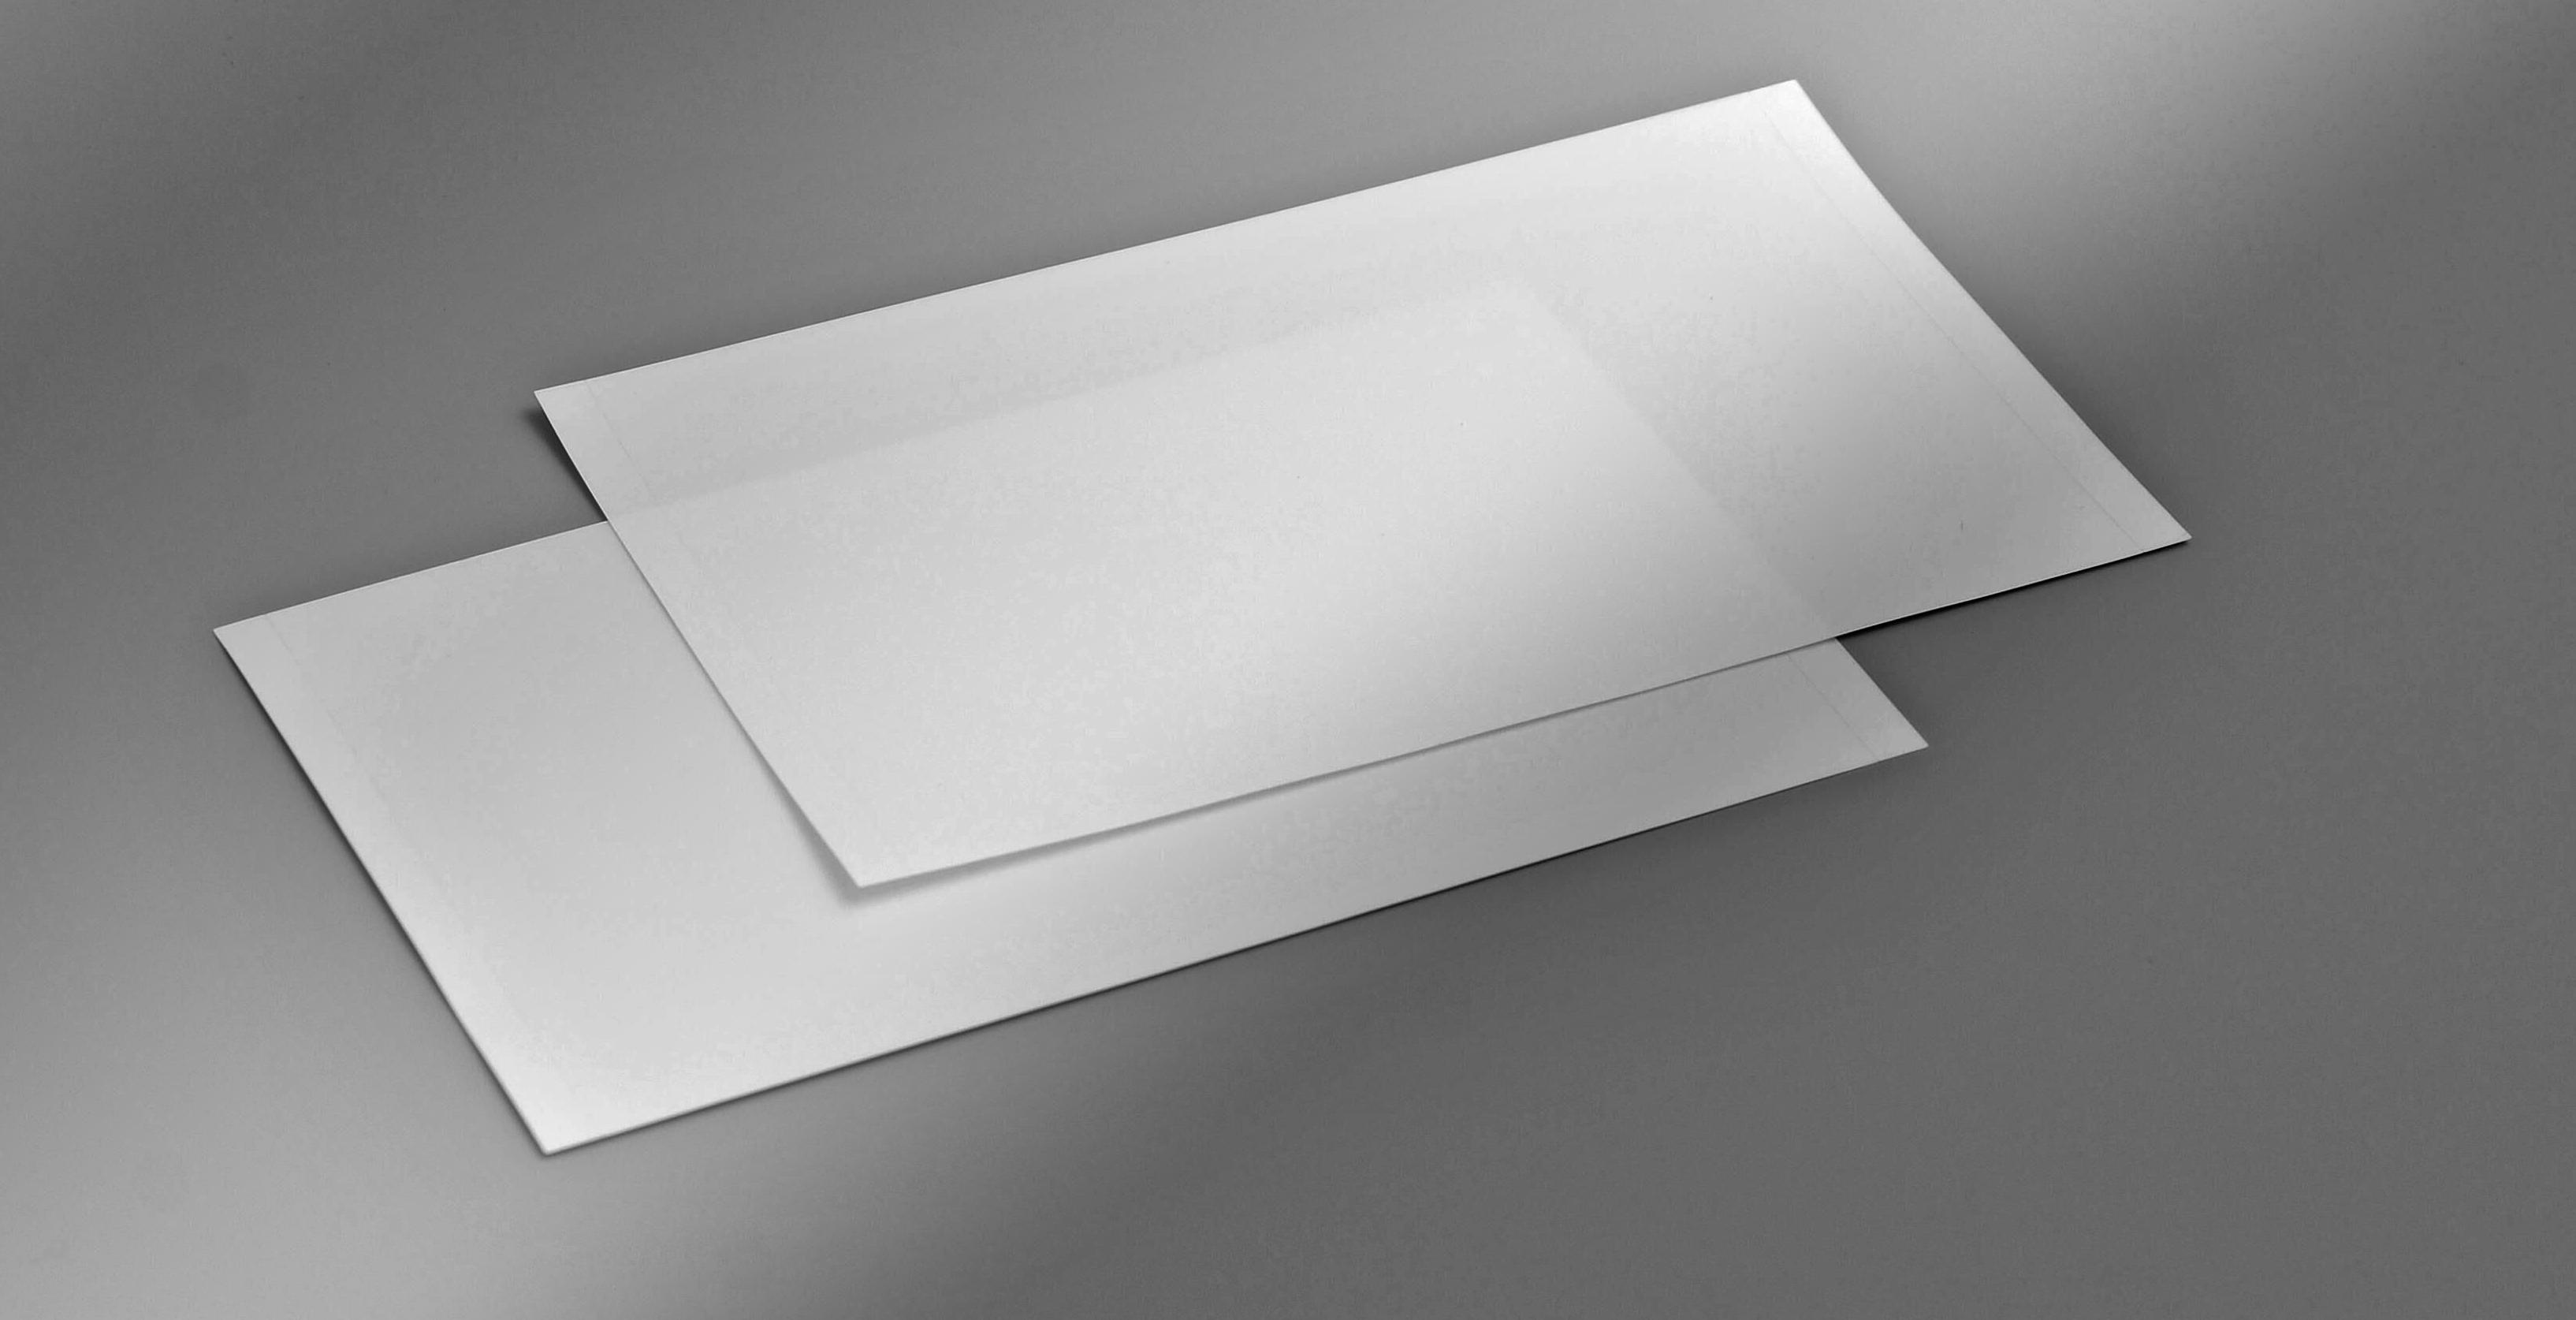 BIOVIRTU PF-1000 荧光定量PCR超高透封板膜